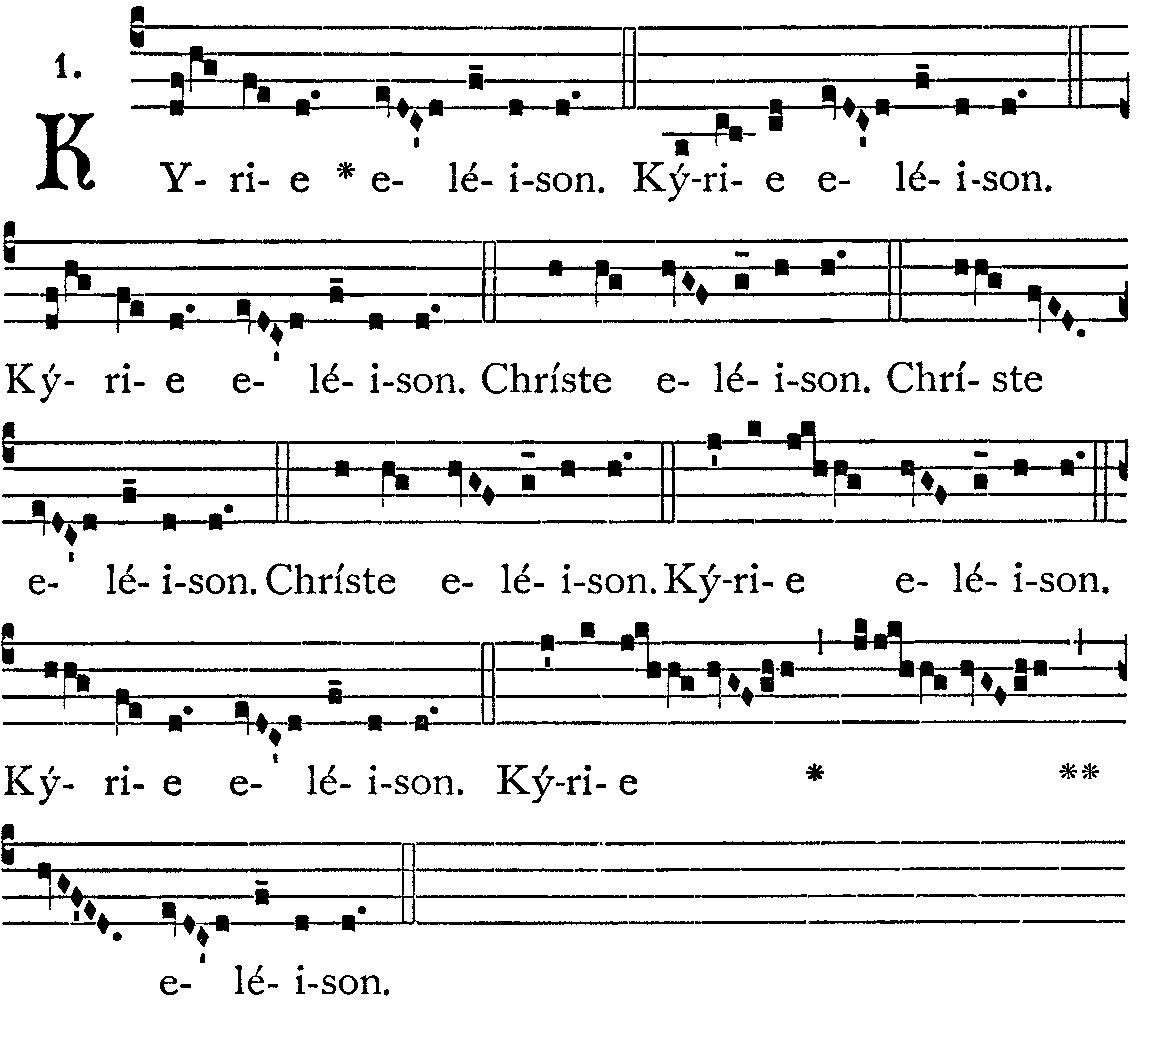 Missa em latim_partitura_Kyrie_Eleison_alme_Pater